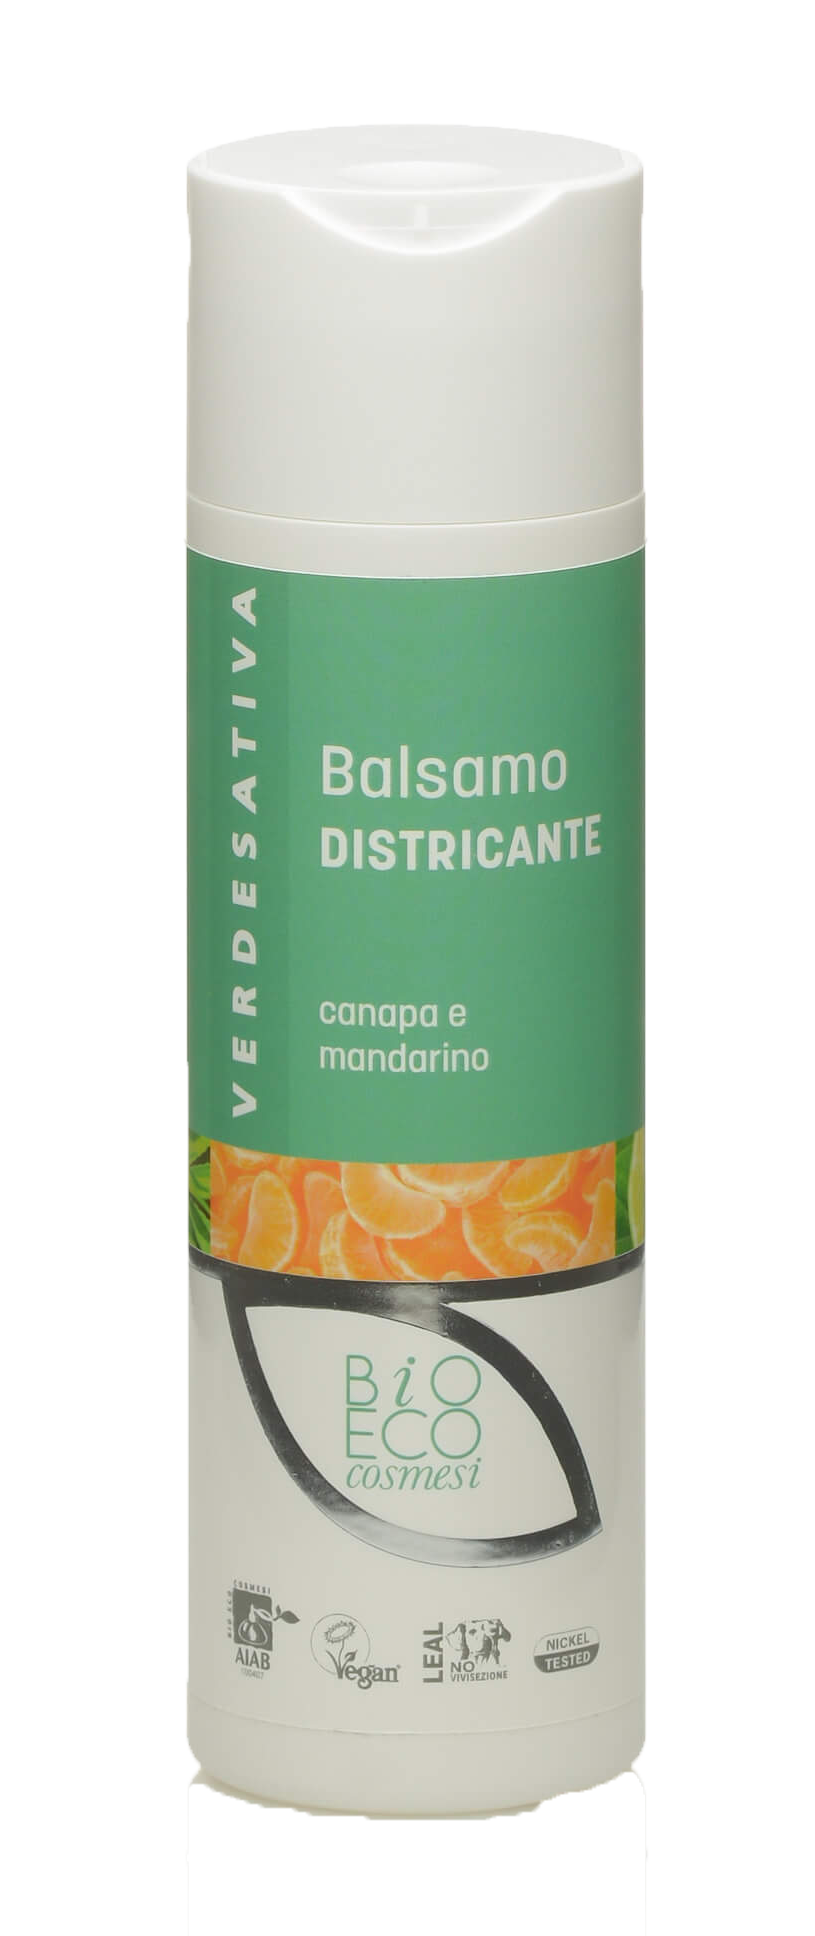 Verdesativa – Balsamo Districante